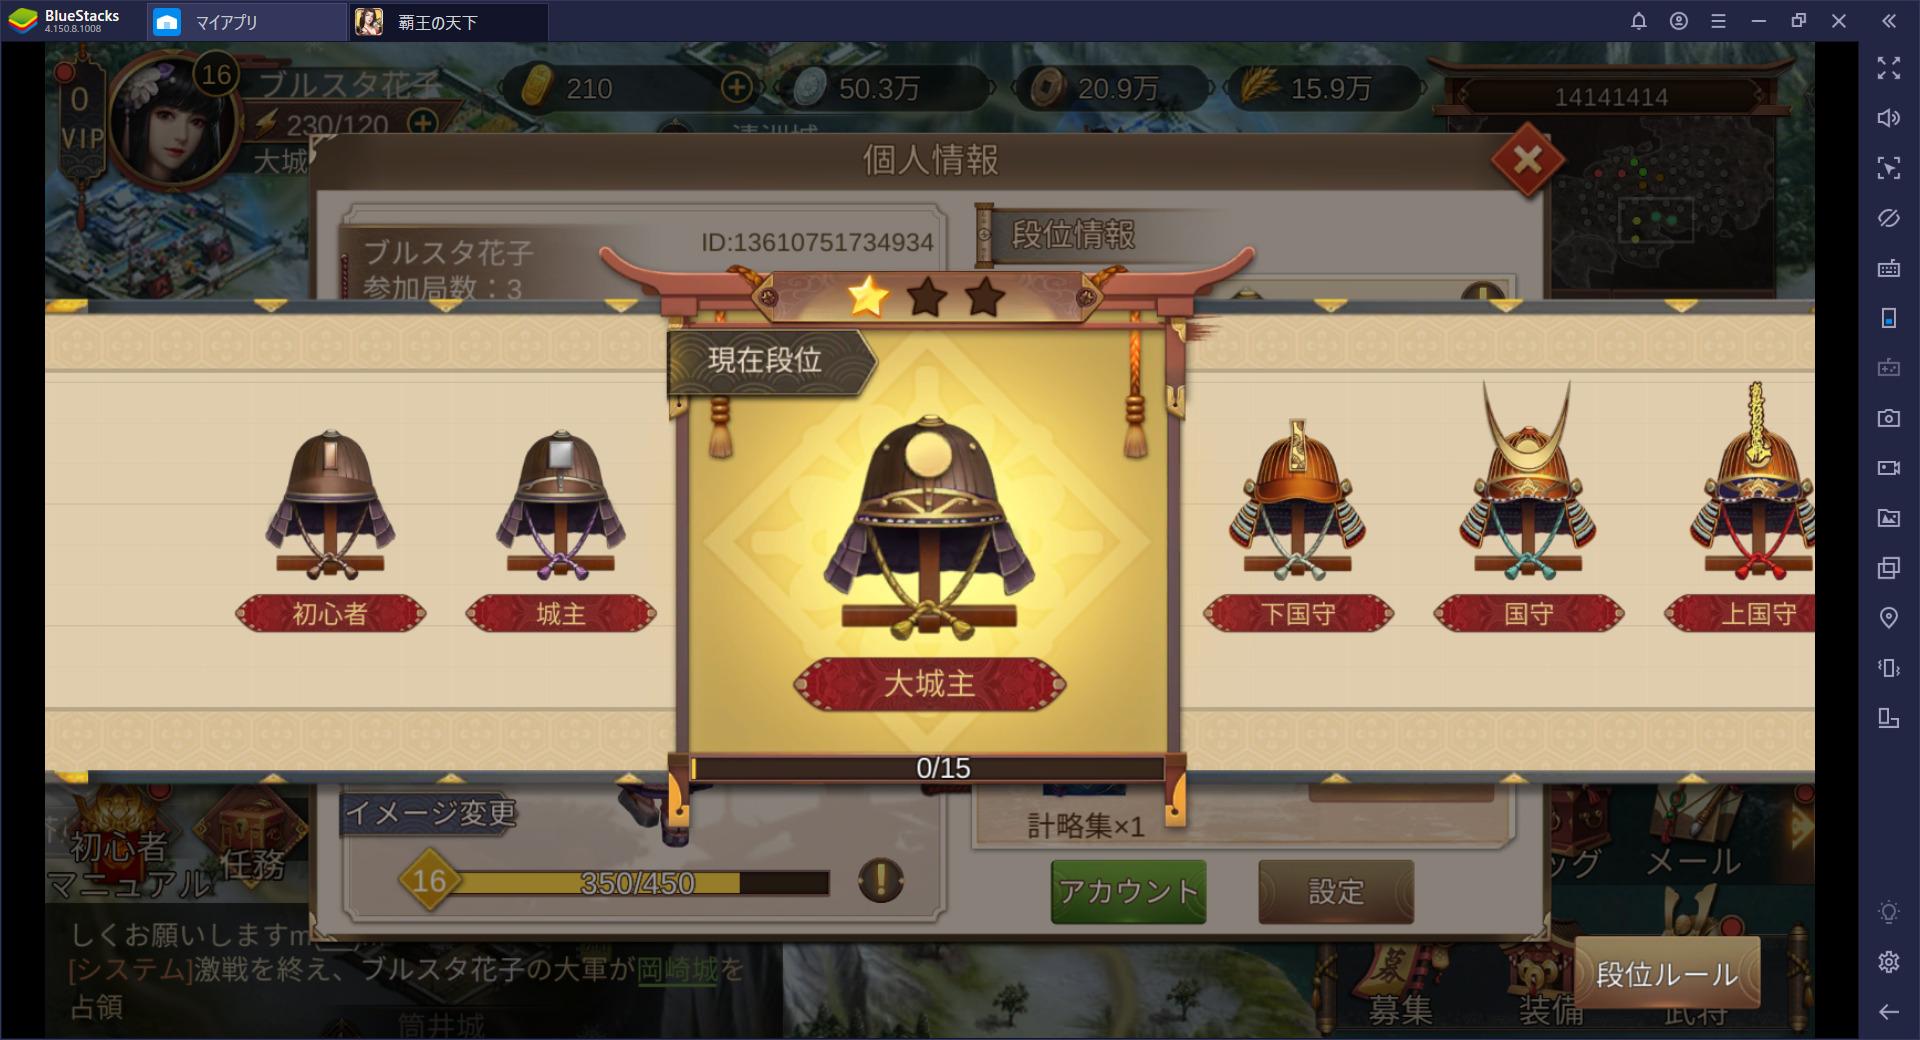 BlueStacksを使ってPCで『覇王の天下 – 戦略シミュレーション』を遊ぼう